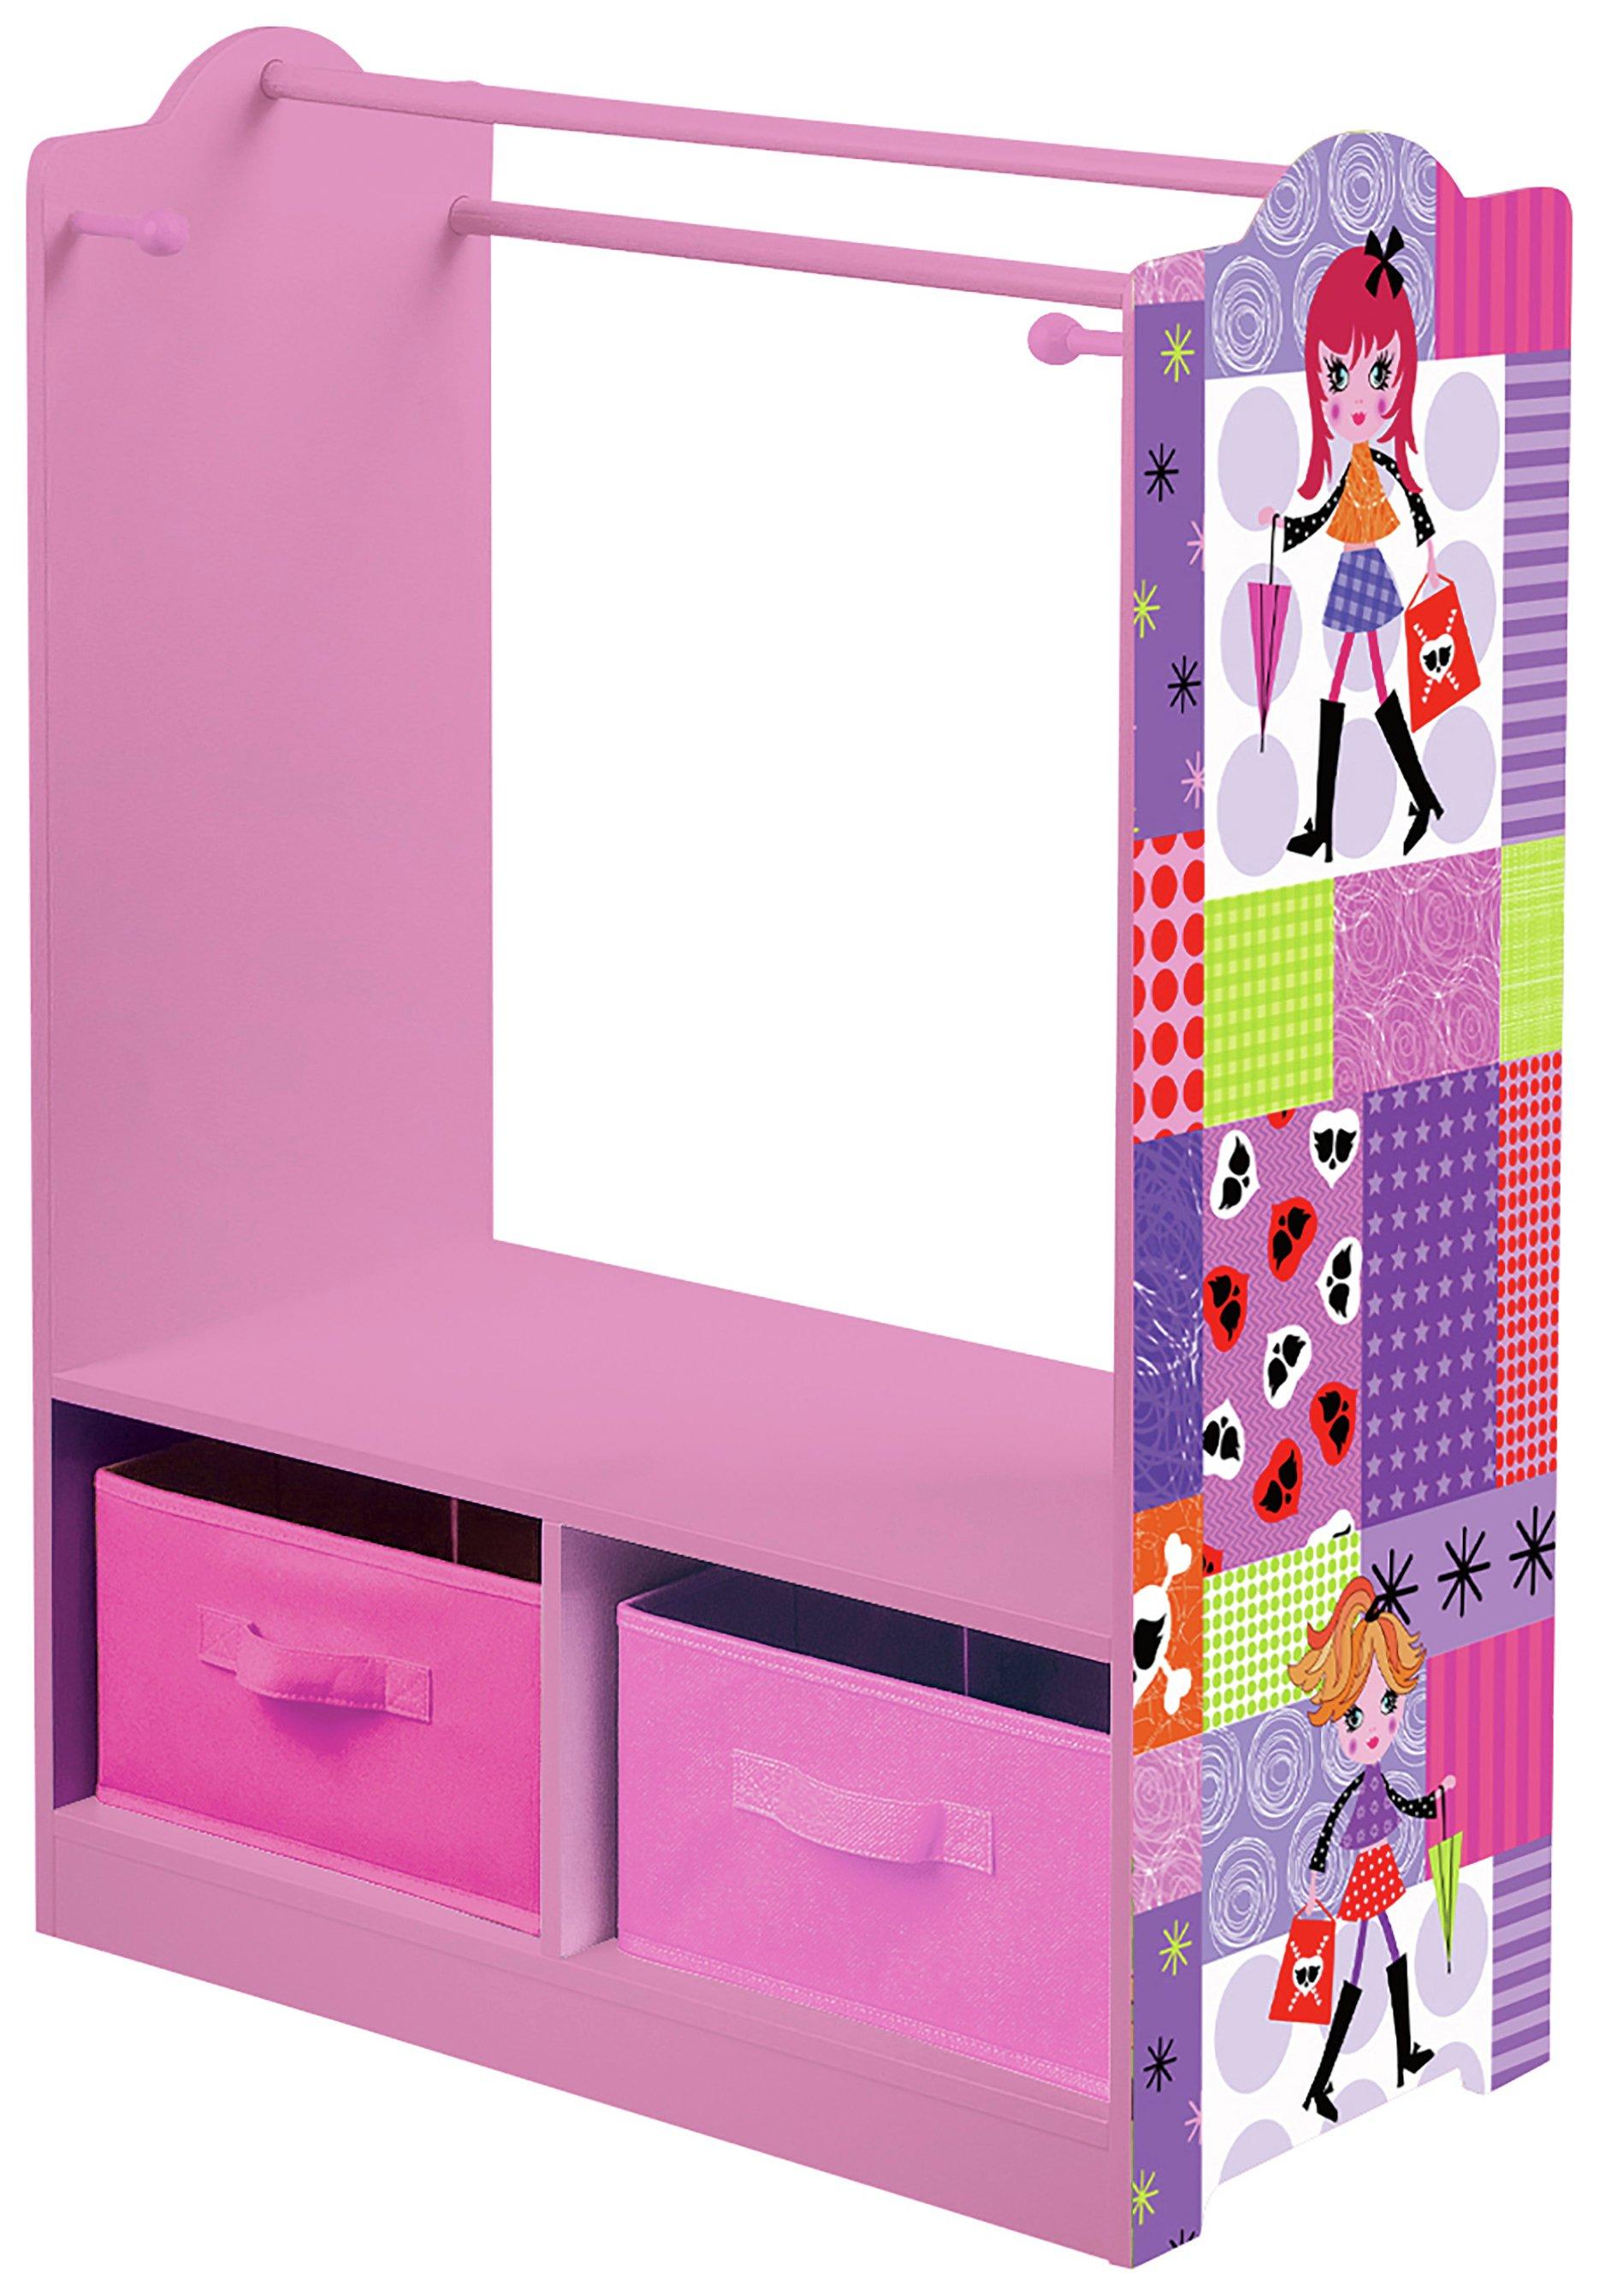 Liberty House Toys Fashion Girl Dress Up With Storage Bins